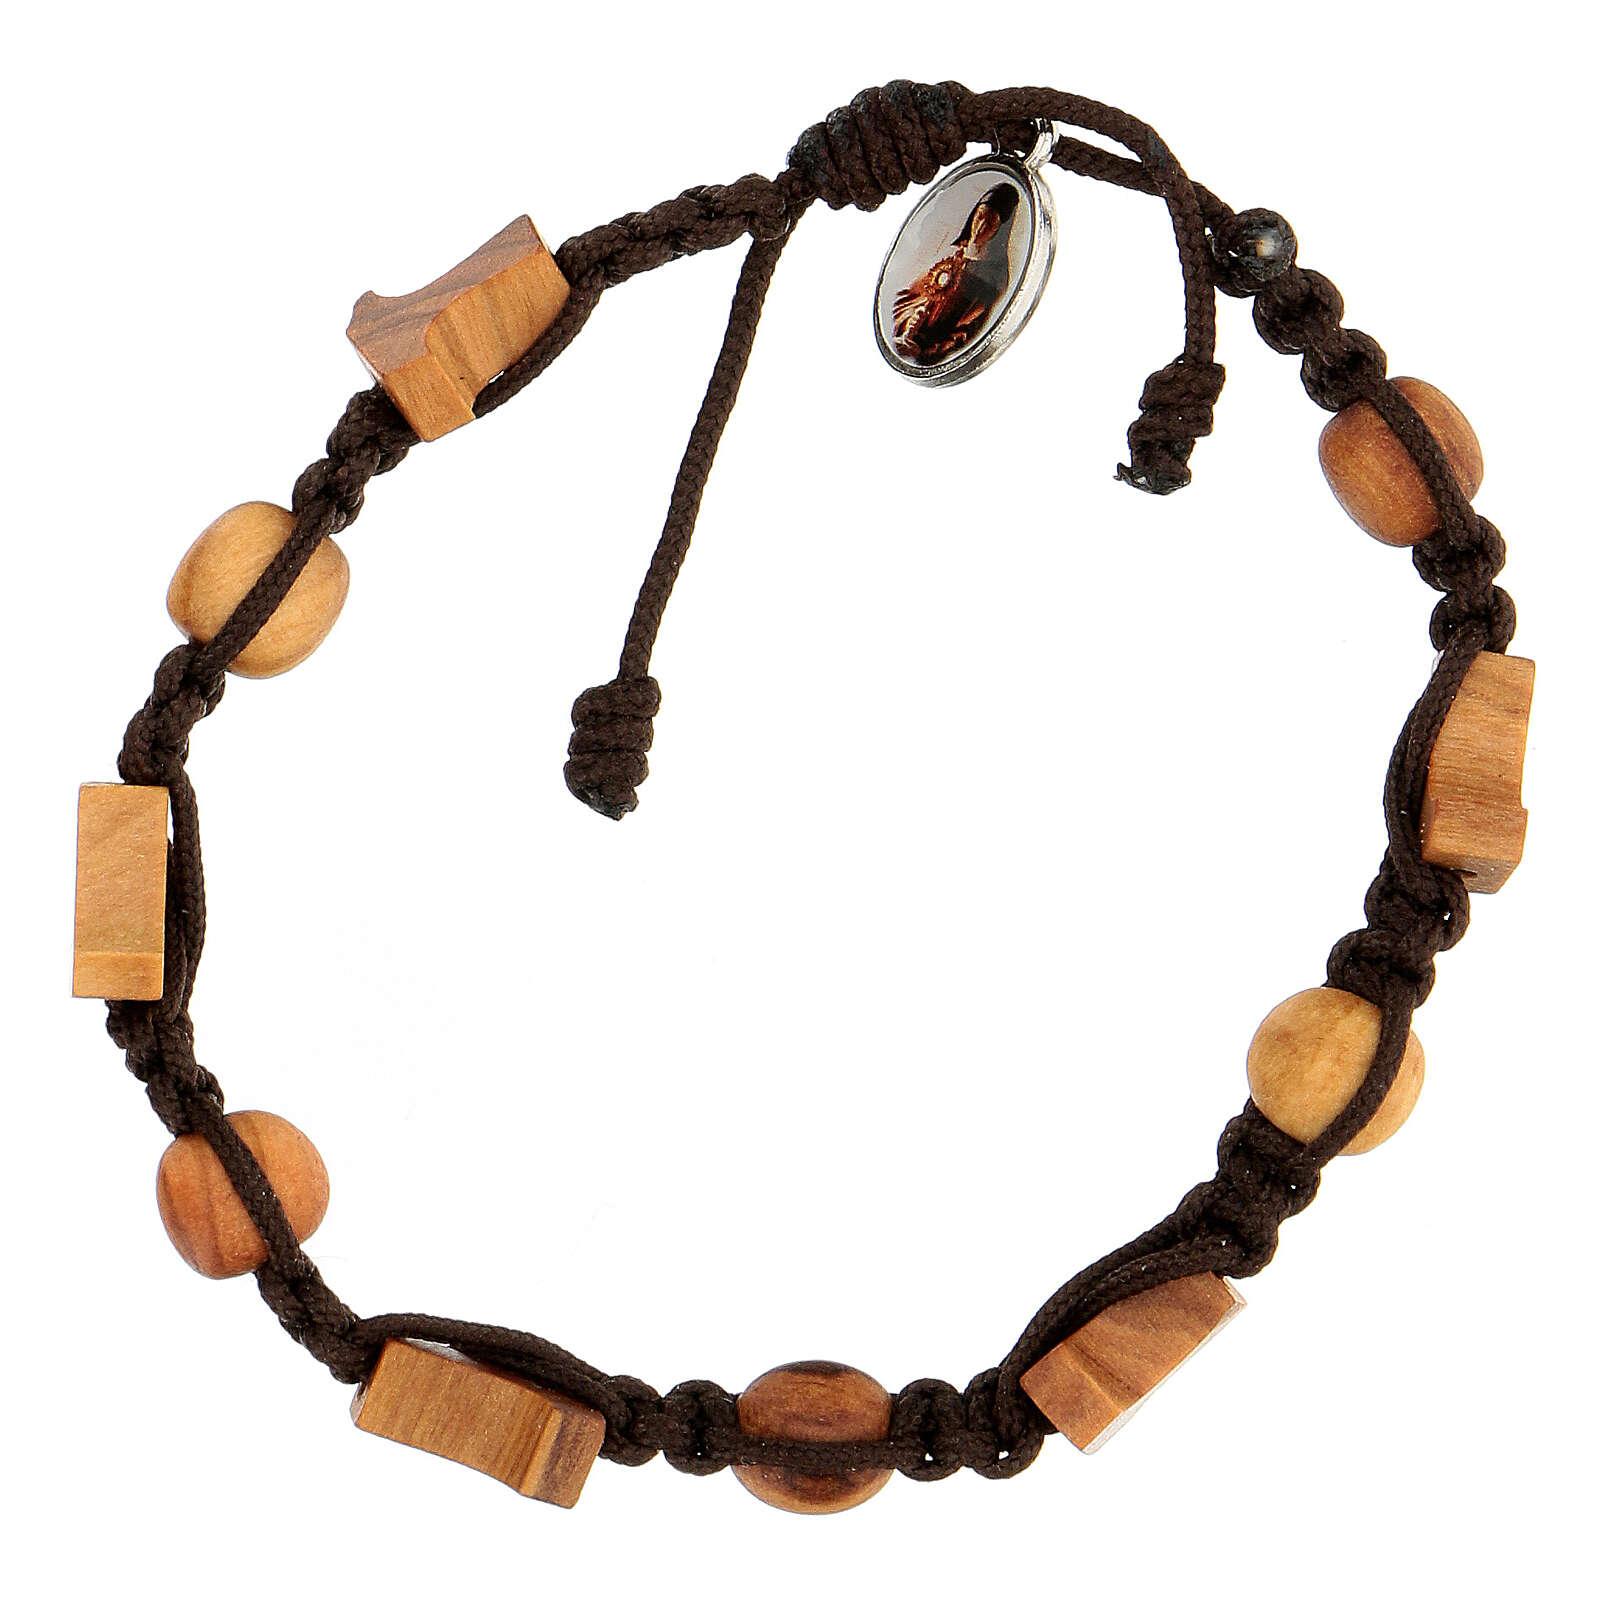 Bracelet Medjugorje crosses brown rope beads 4